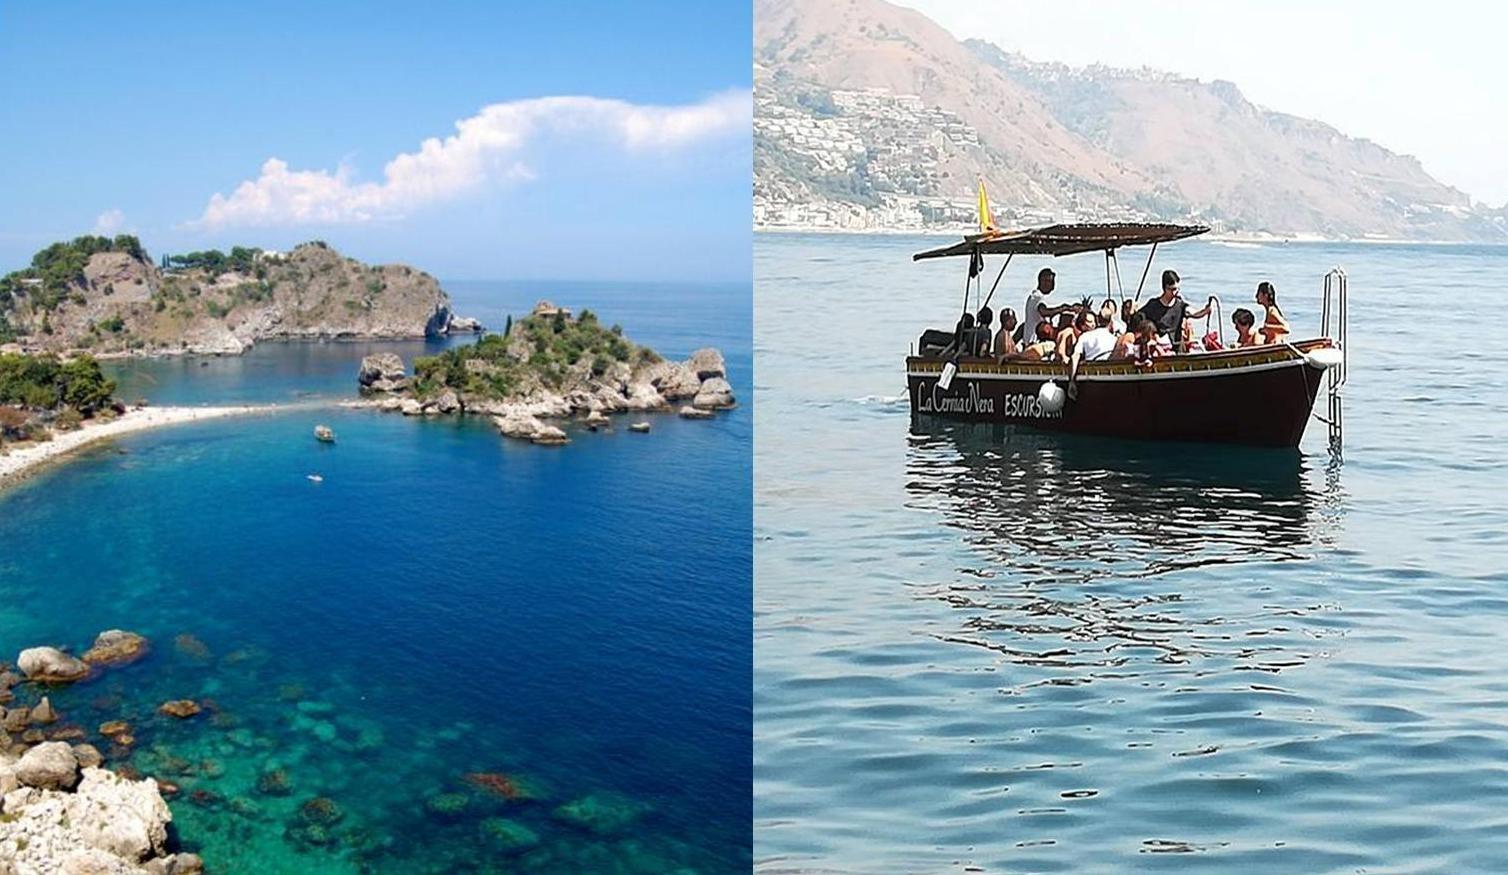 boat-tour-1584474746.jpg